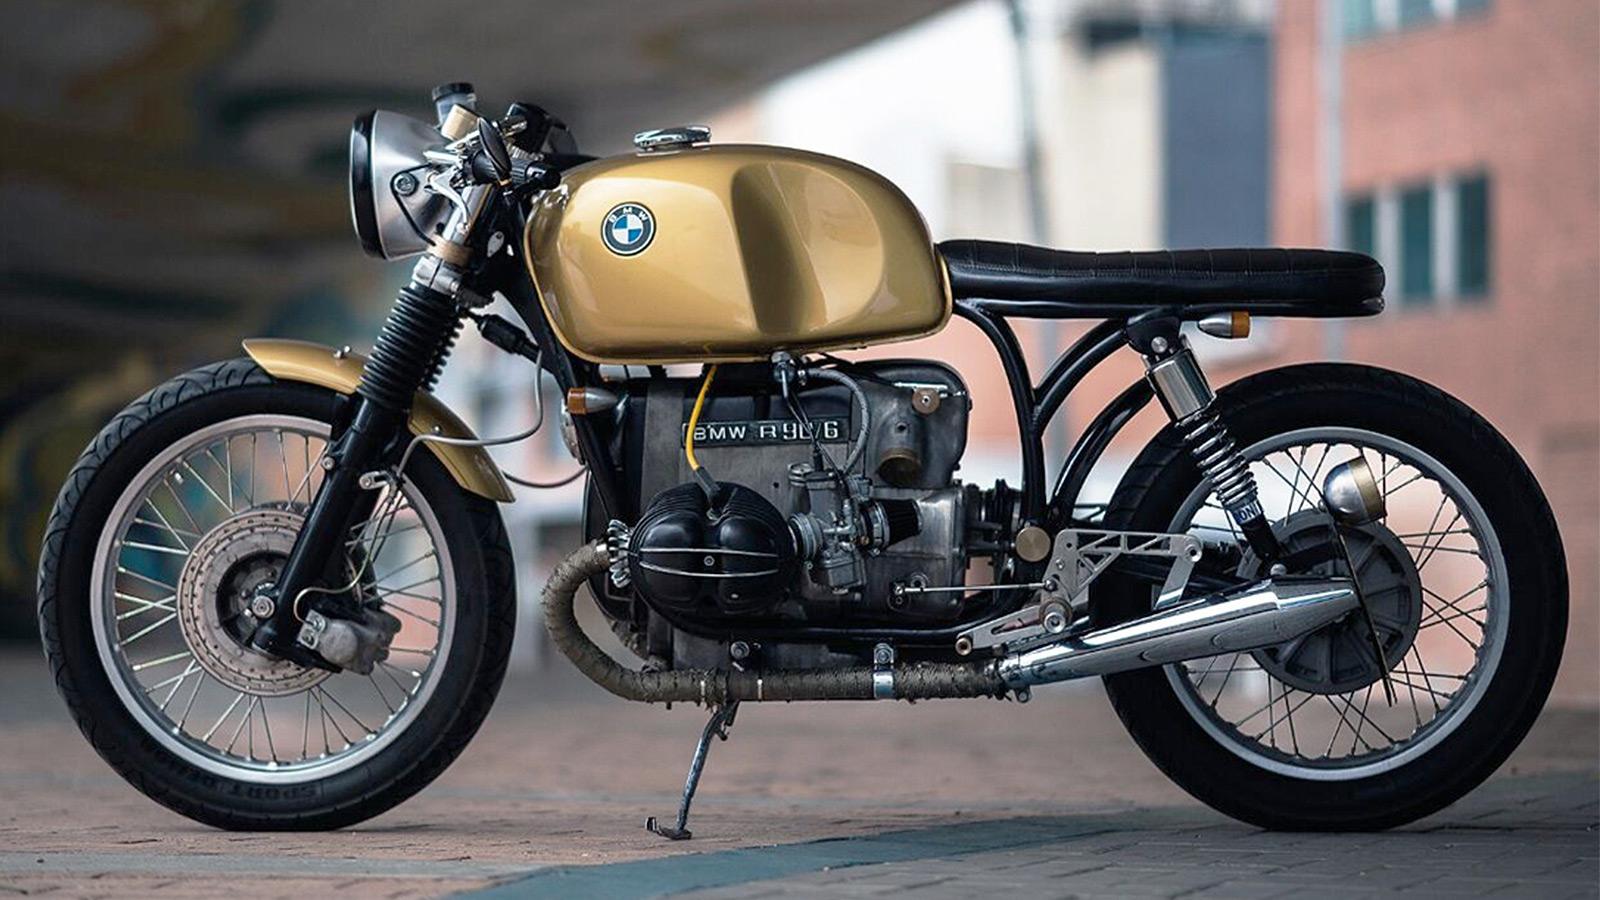 Pasquale BMW R90/6 Golden Beauty